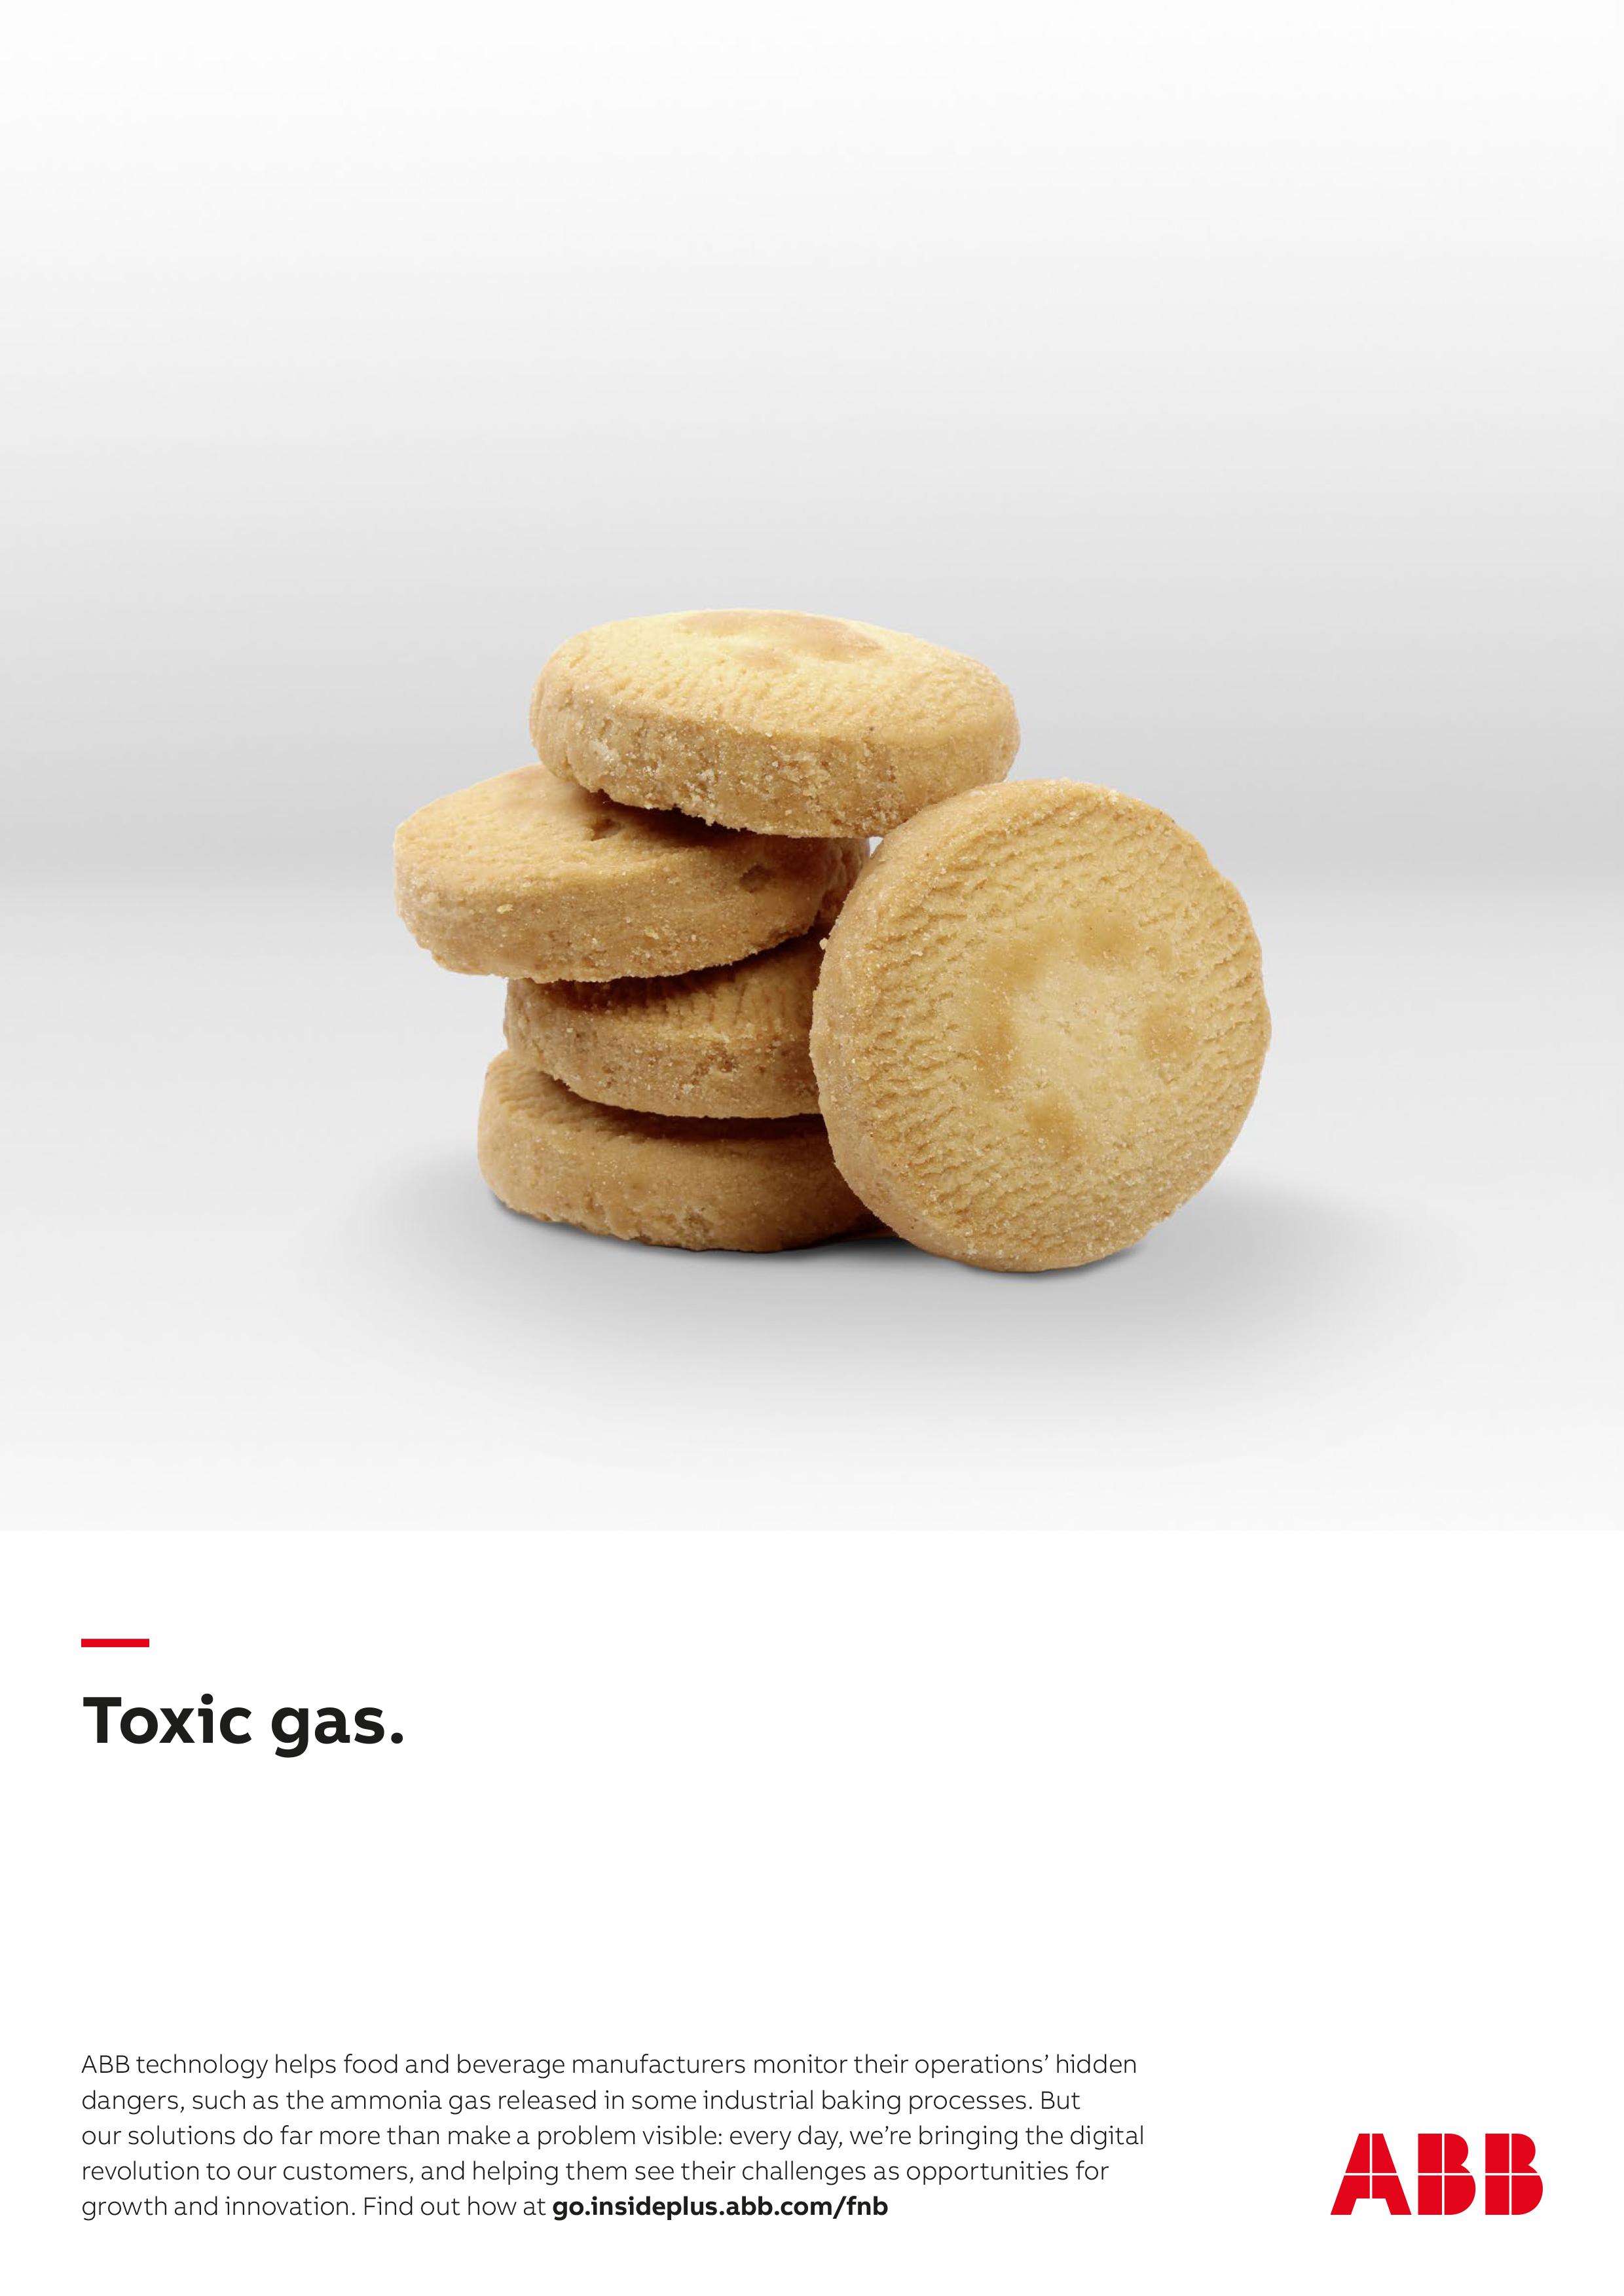 ABB_FaB_internal_campaign_behindthebite_cookies_A4.jpg